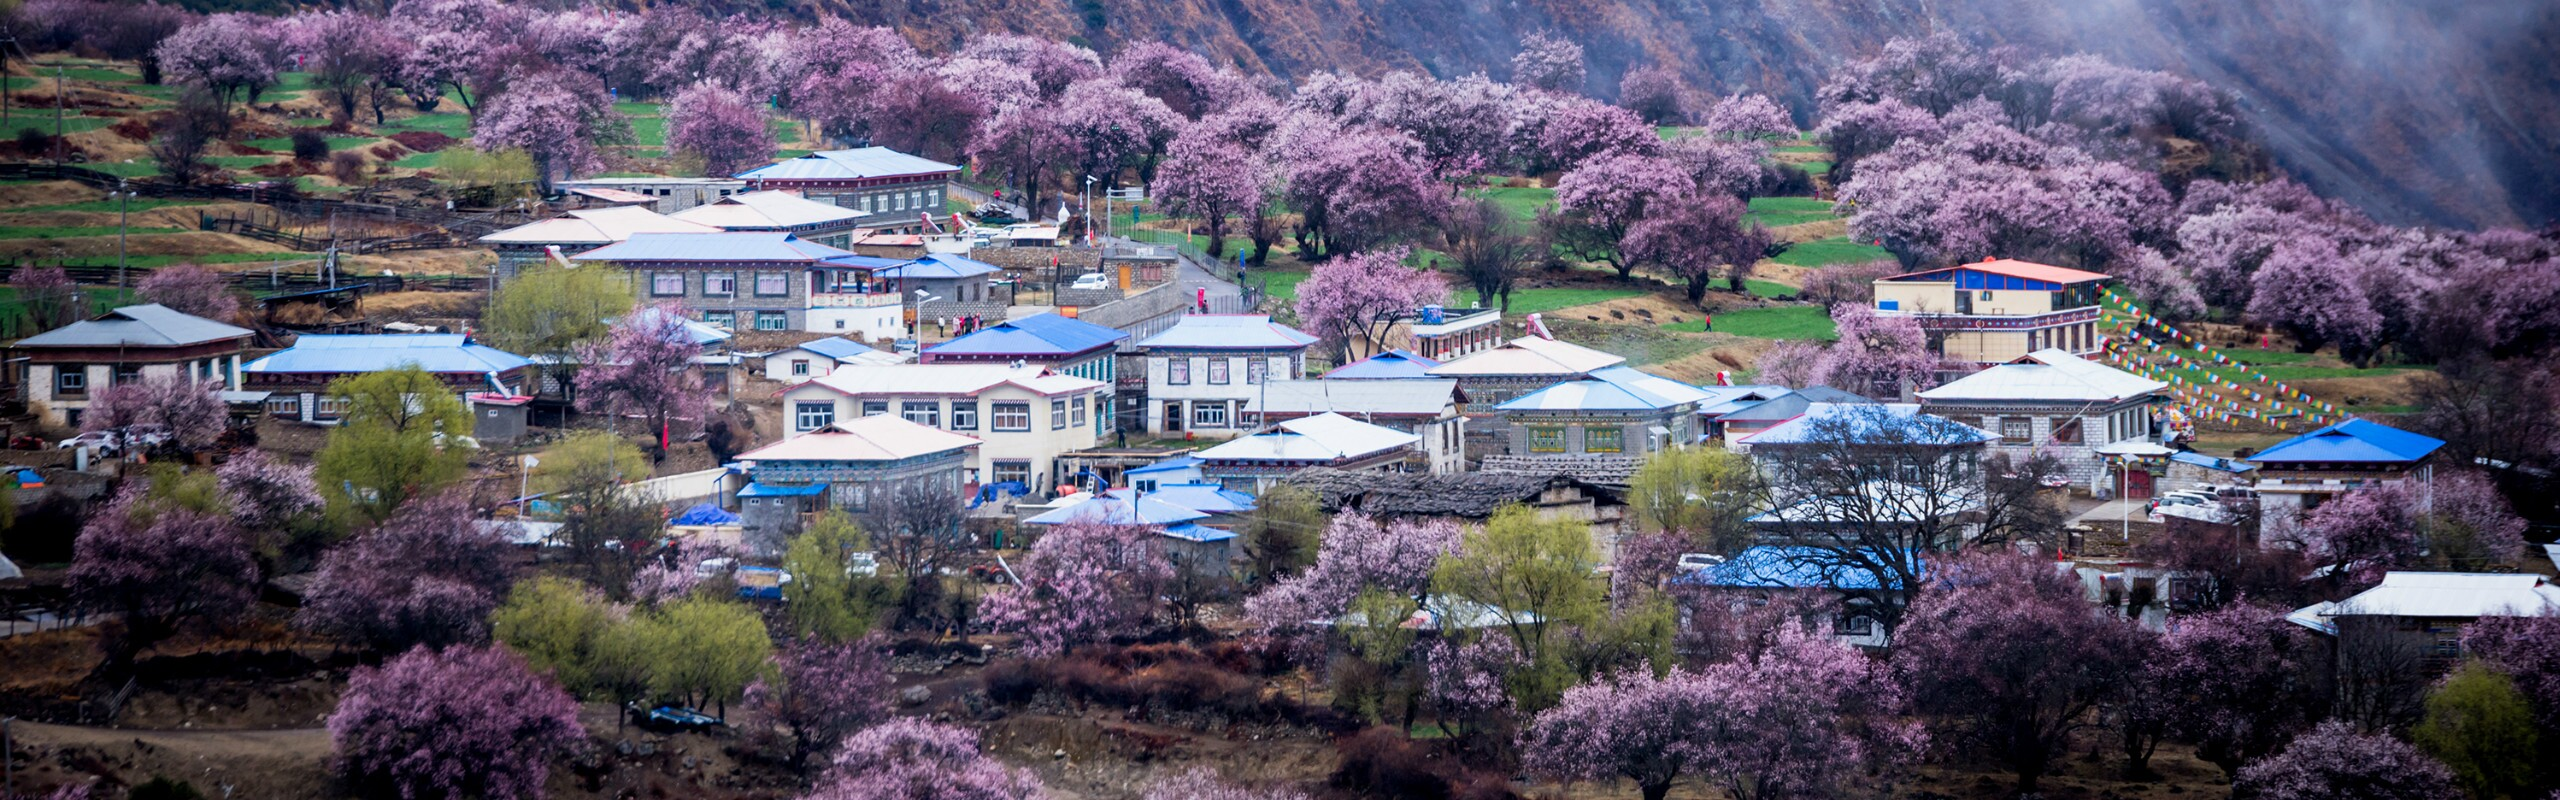 8-Day Lhasa, Nyingchi, and Bome Tour